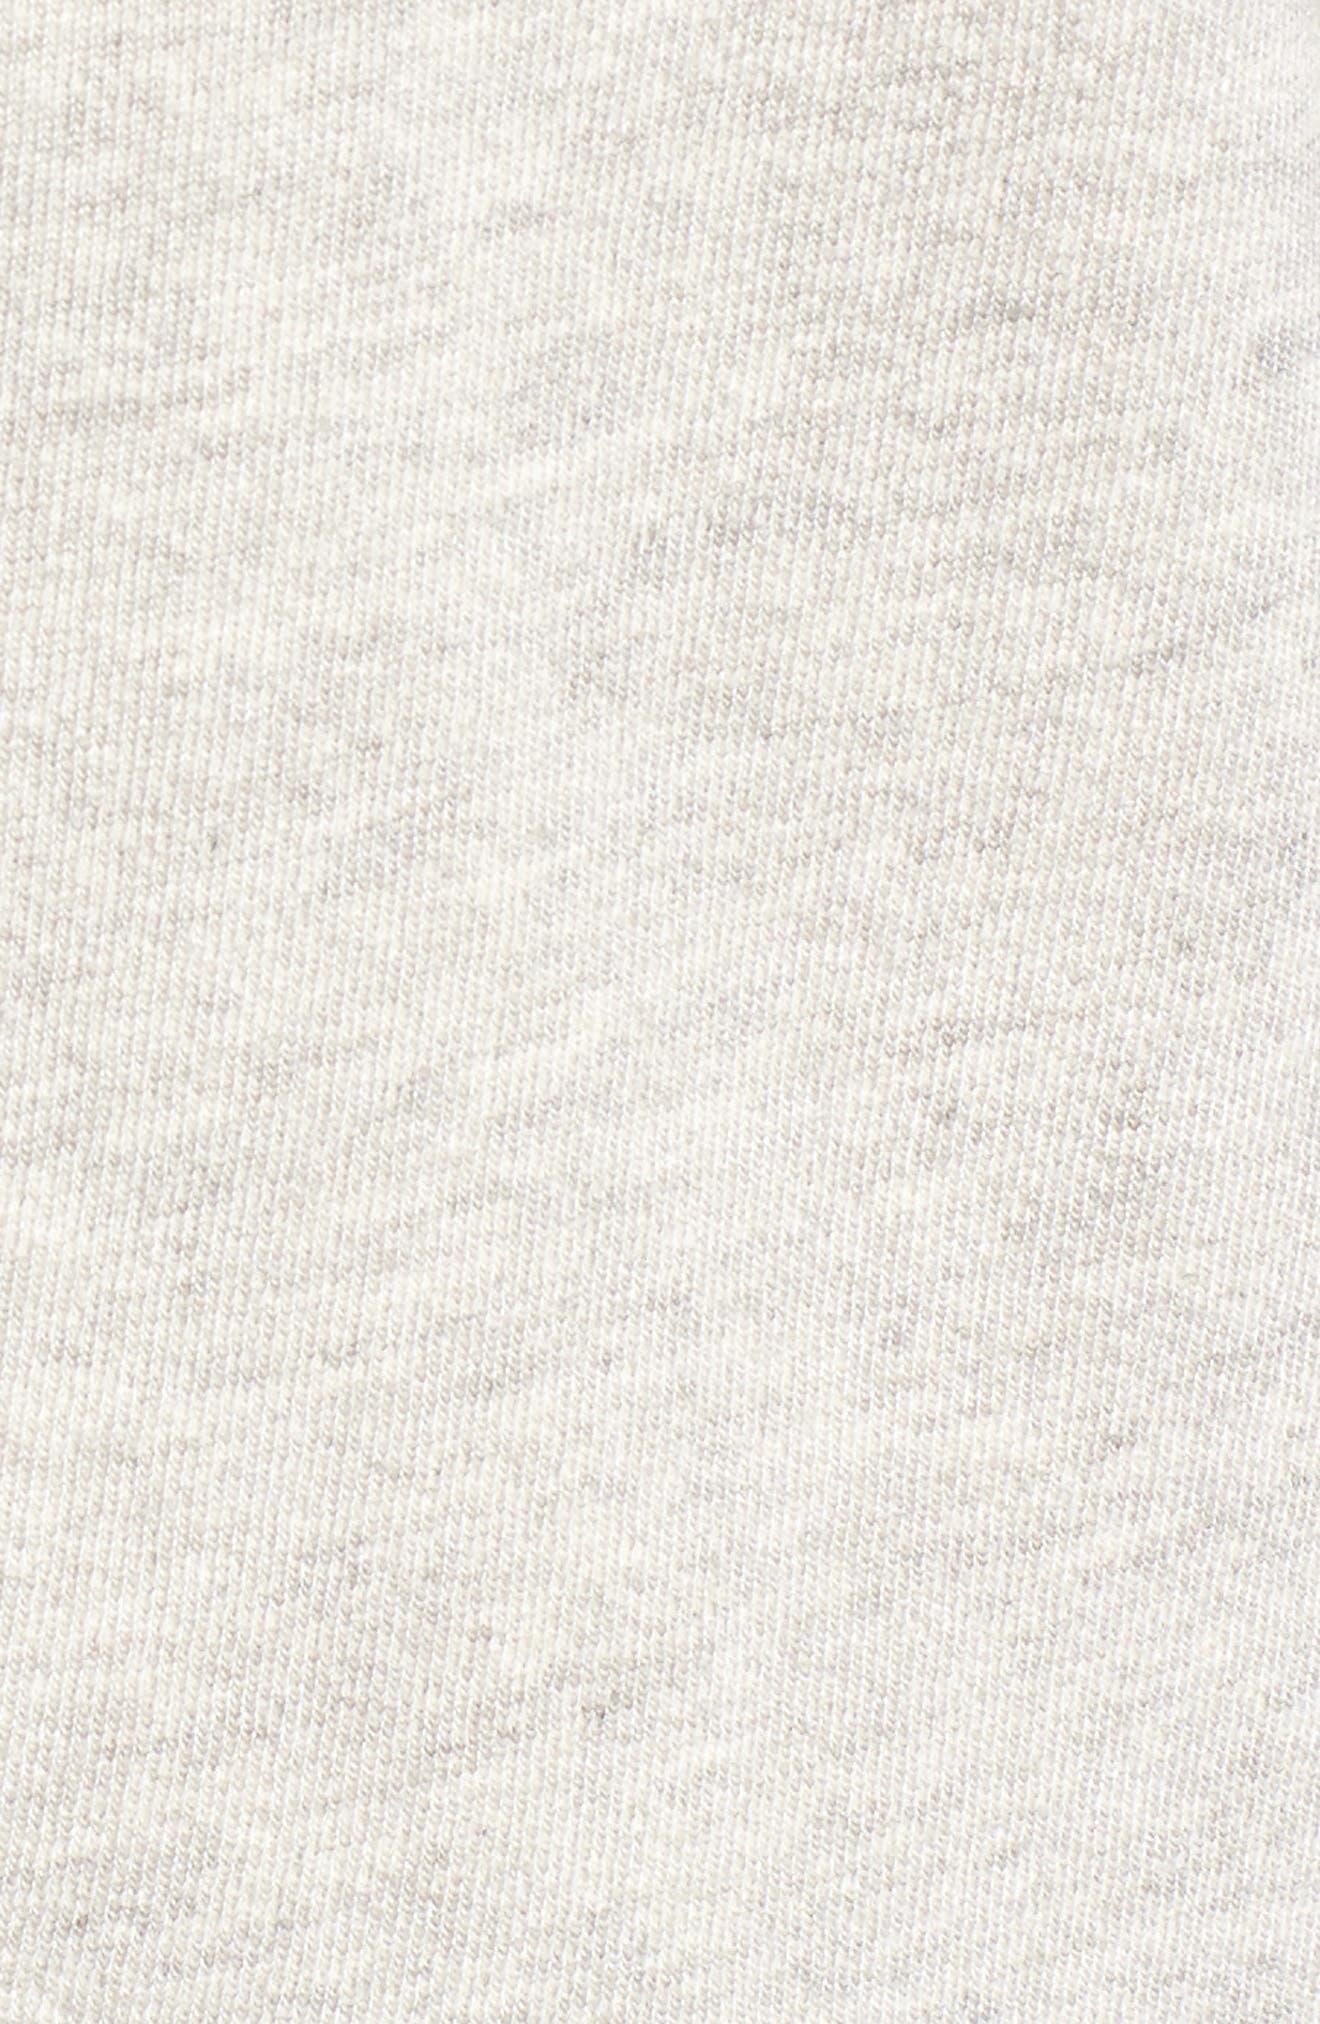 Helix Turtleneck Sweatshirt,                             Alternate thumbnail 5, color,                             Heather Grey